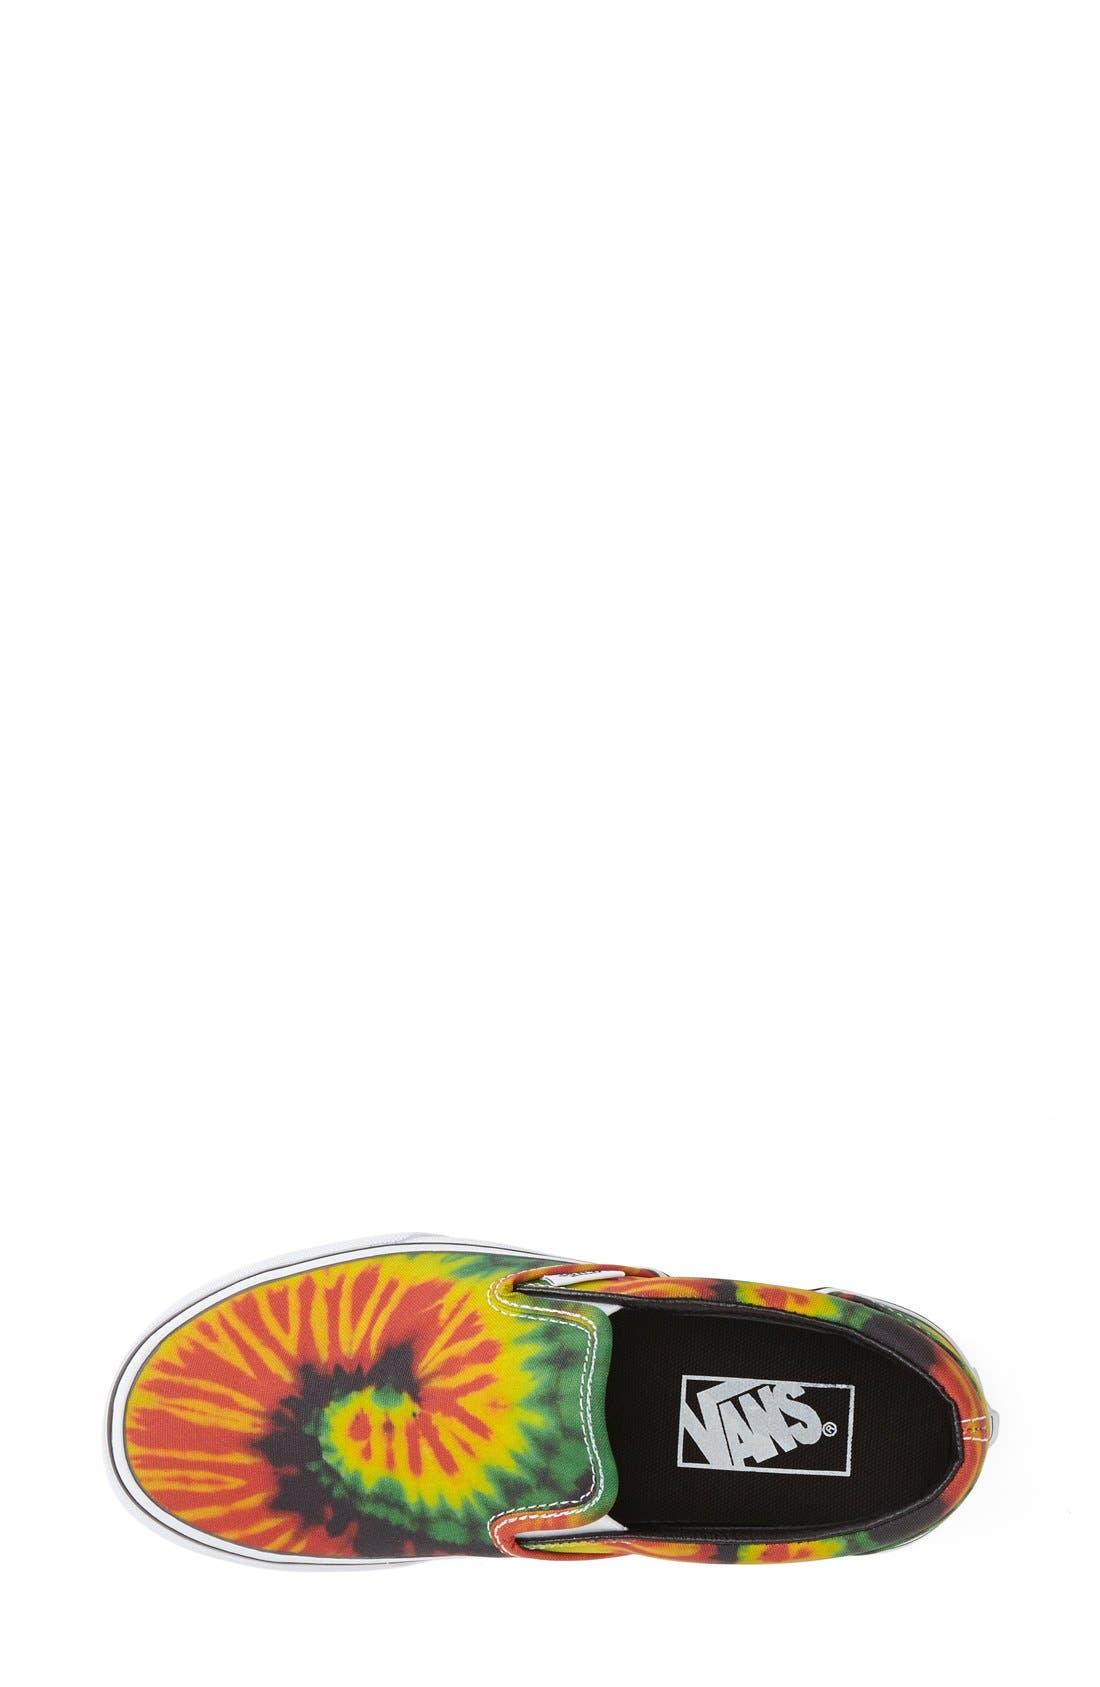 Alternate Image 3  - Vans 'Tie Dye' Slip-On Sneaker (Women)